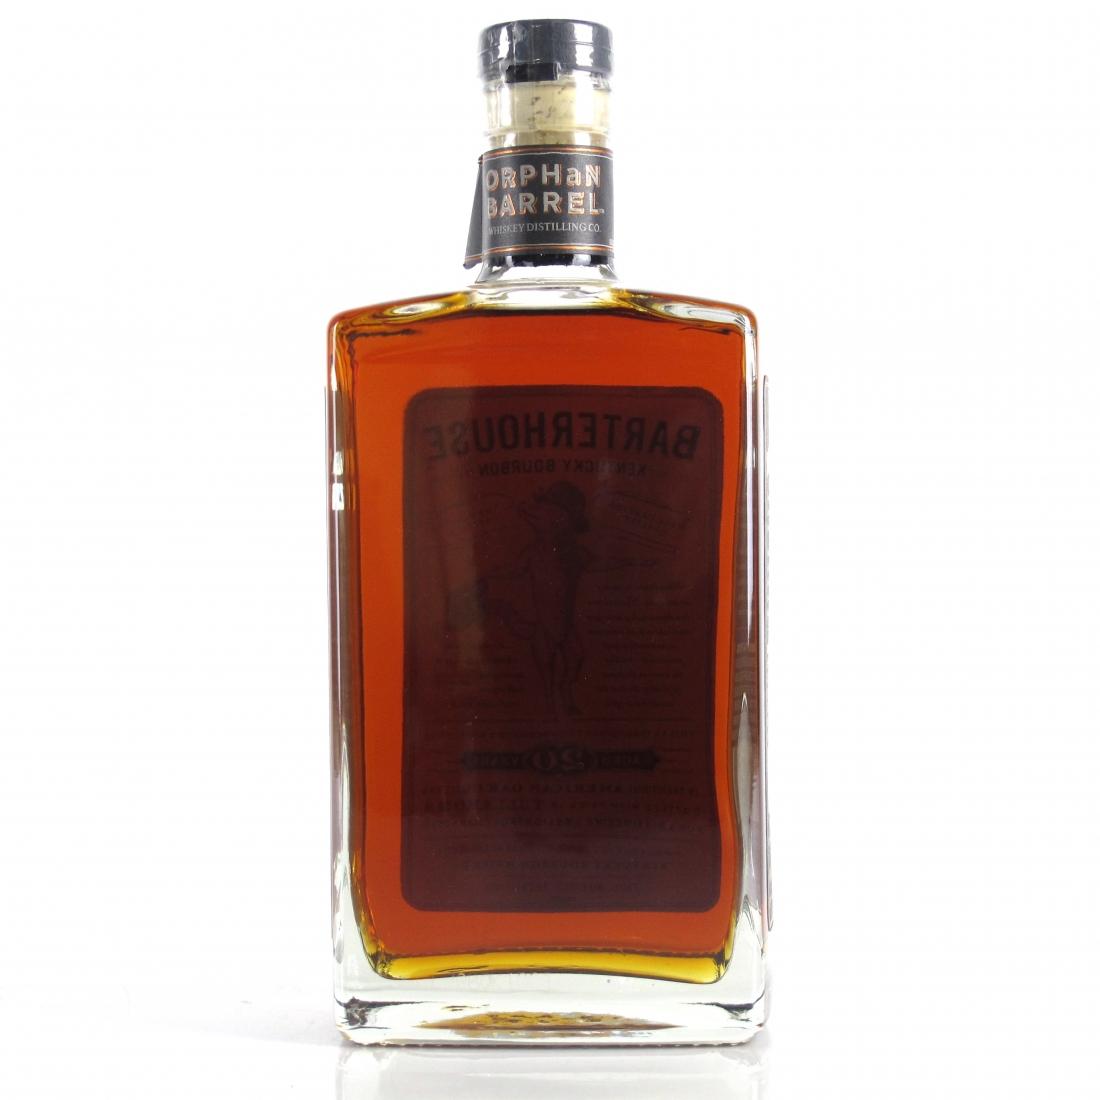 Orphan Barrel Barterhouse 20 Year Old Bourbon 75cl